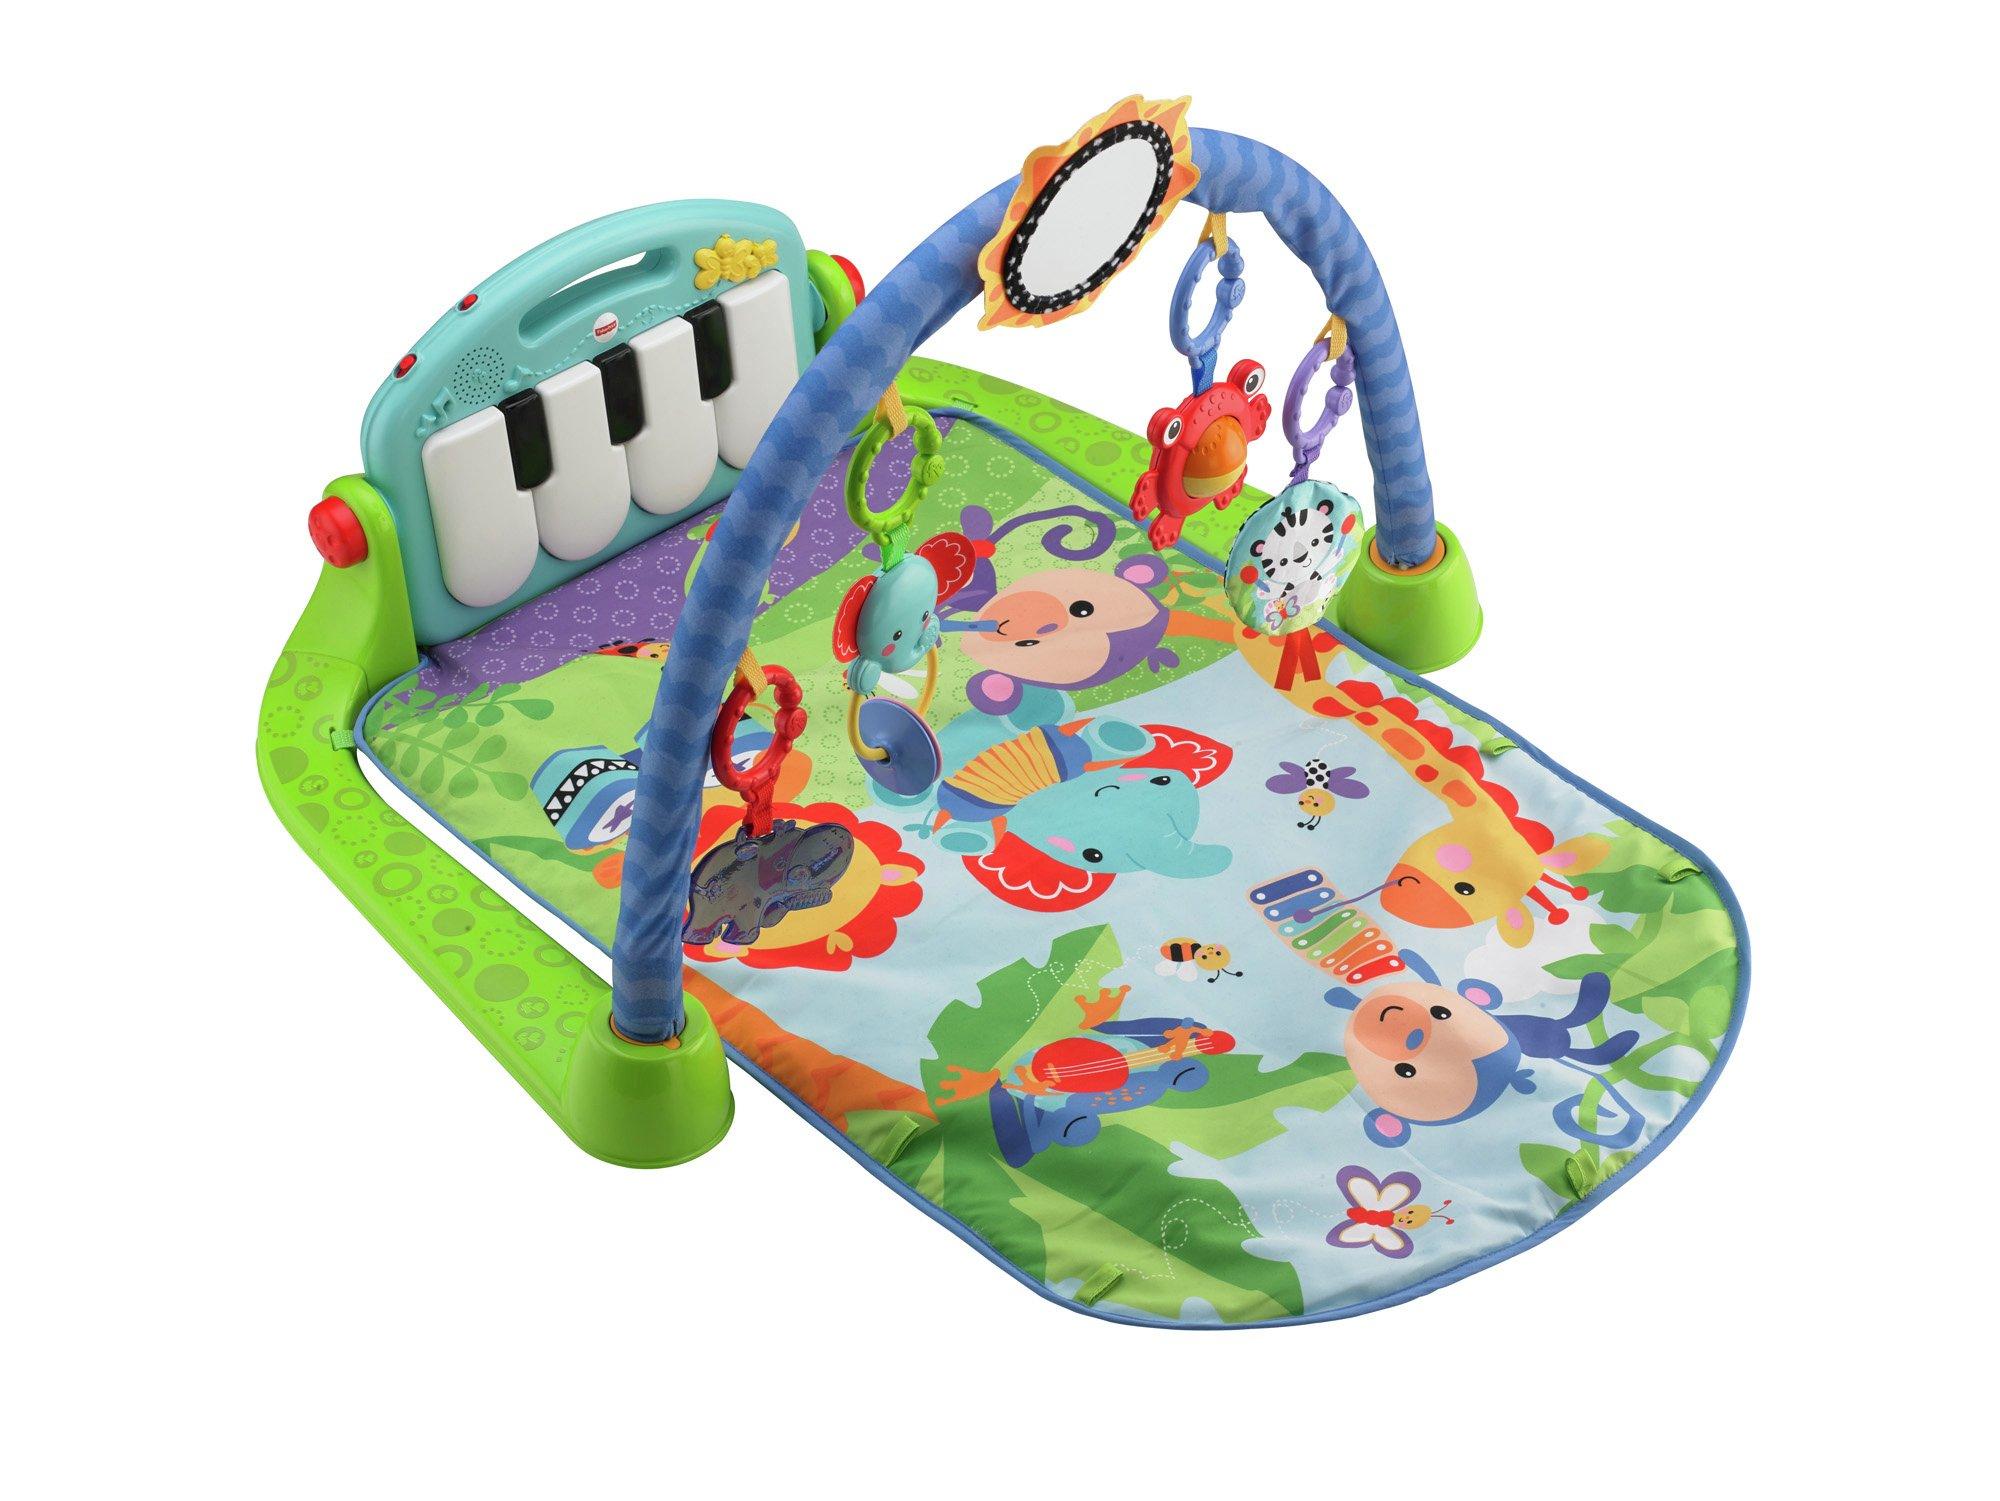 Fisher-Price Kick 'n' Play Piano Gym